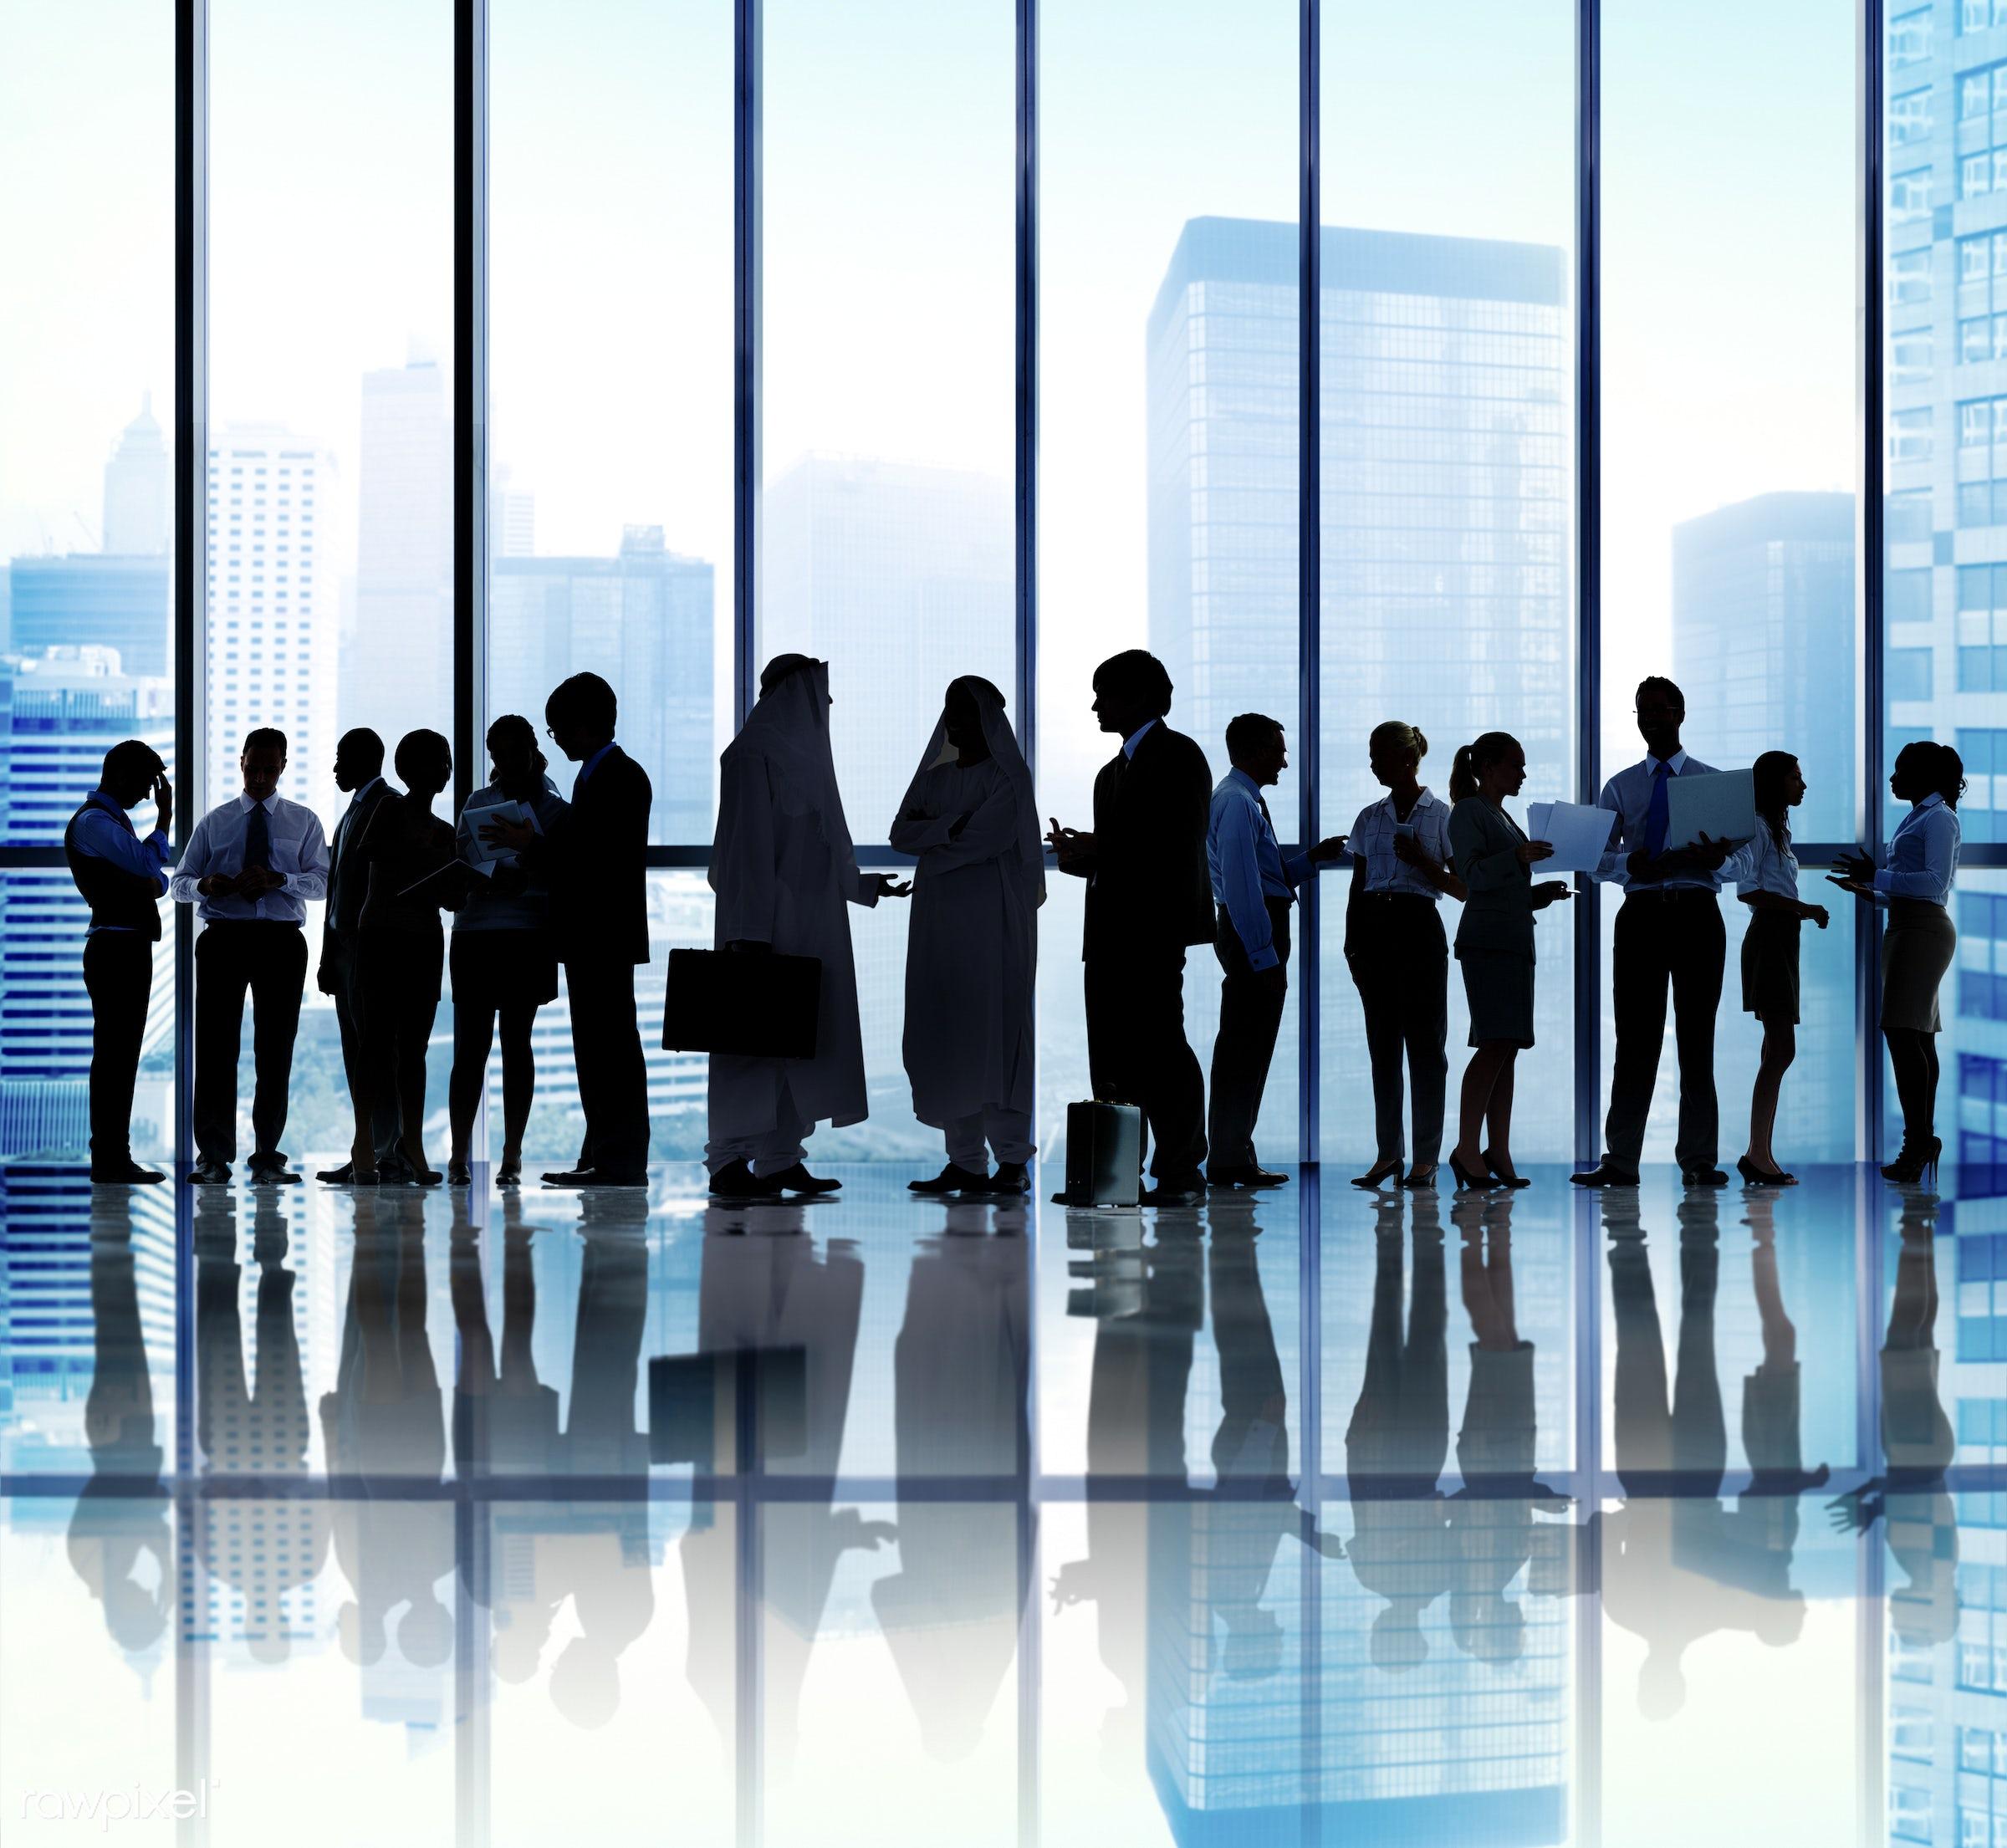 backlit, brainstorming, buildings, business, business people, businessmen, businesswomen, city, colleagues, communication,...